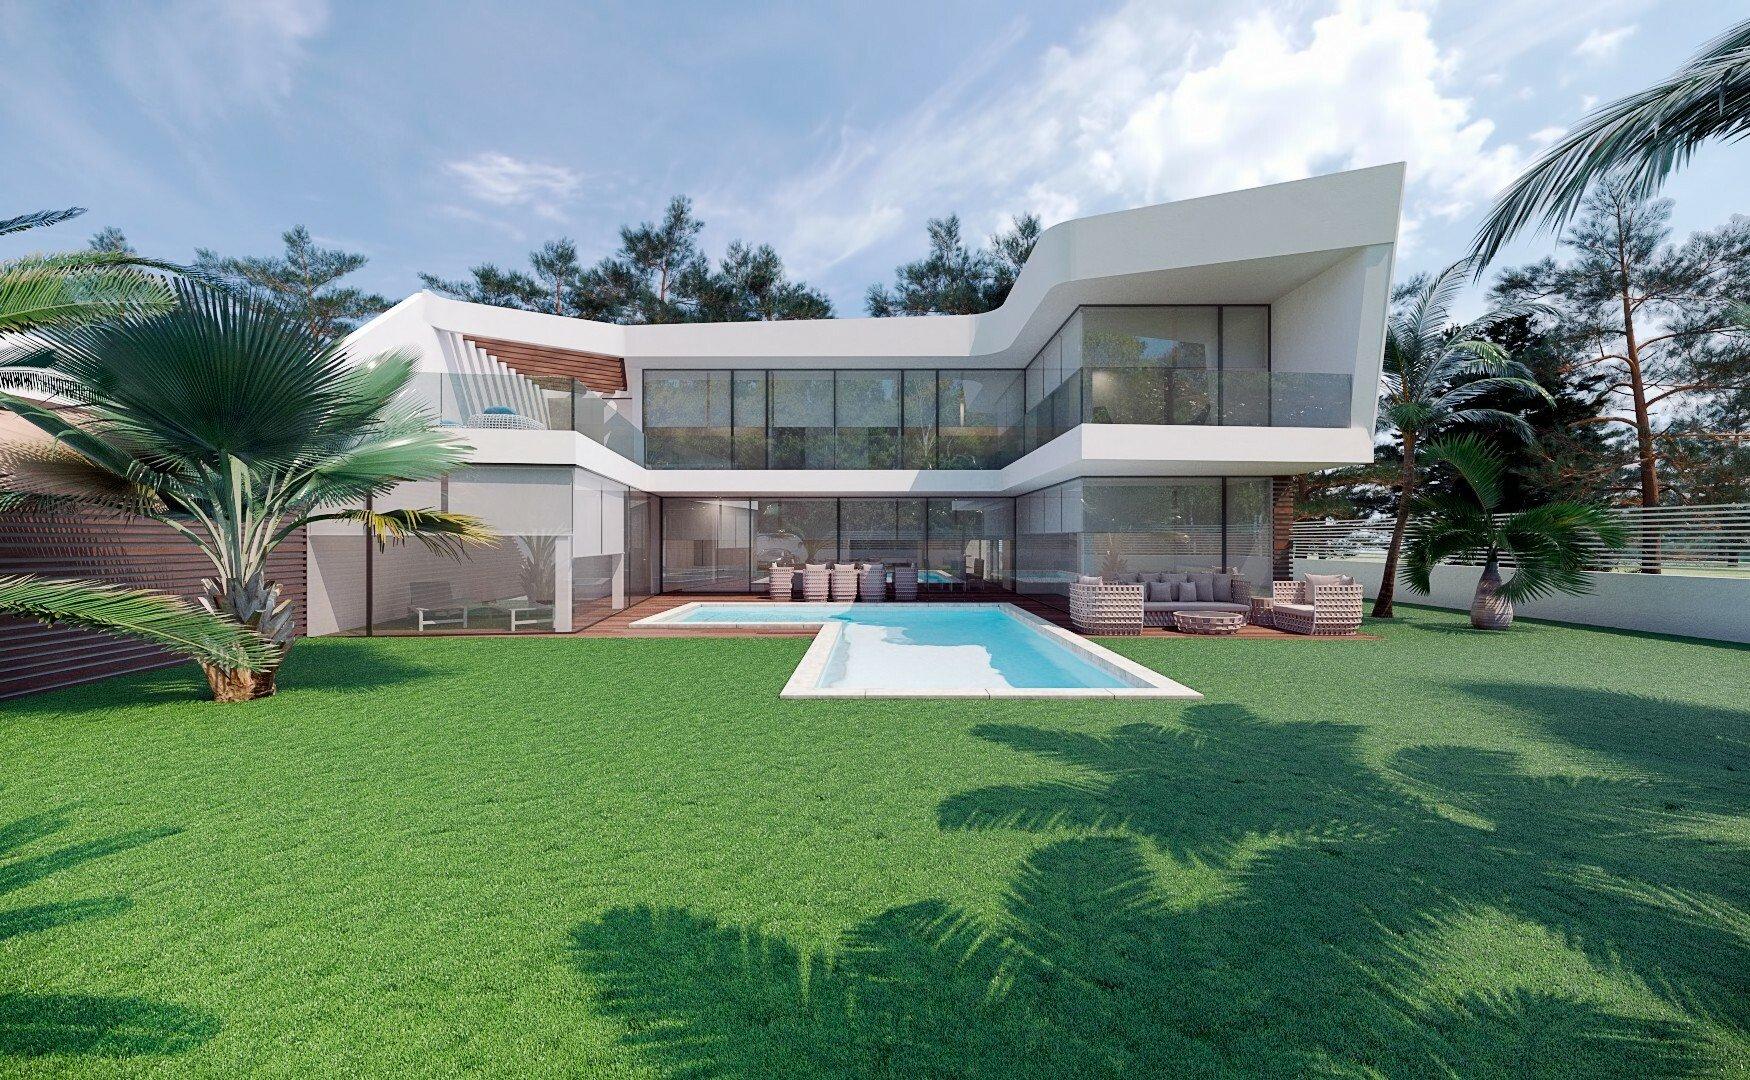 Villa in Altea, Valencian Community, Spain 1 - 11581726